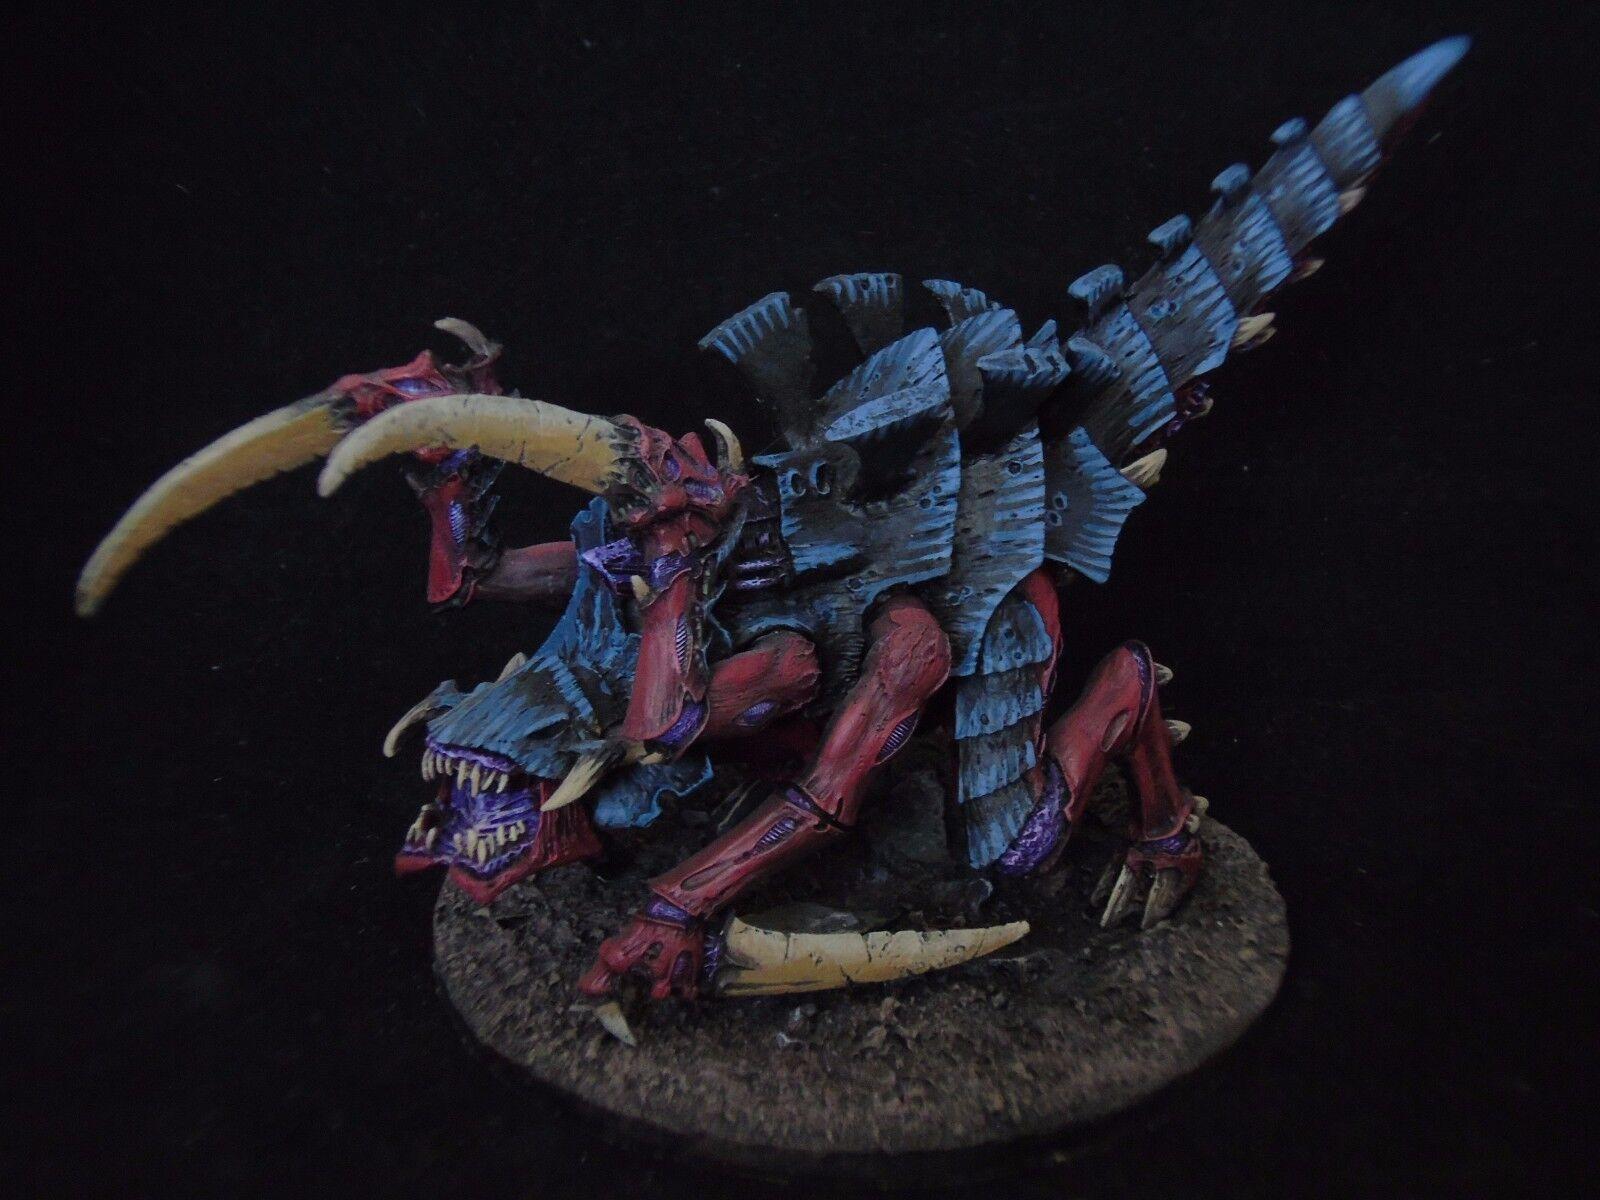 Warhammer 40,000 Forgeworld Tyranid Scythed Hierodule Pro Painted